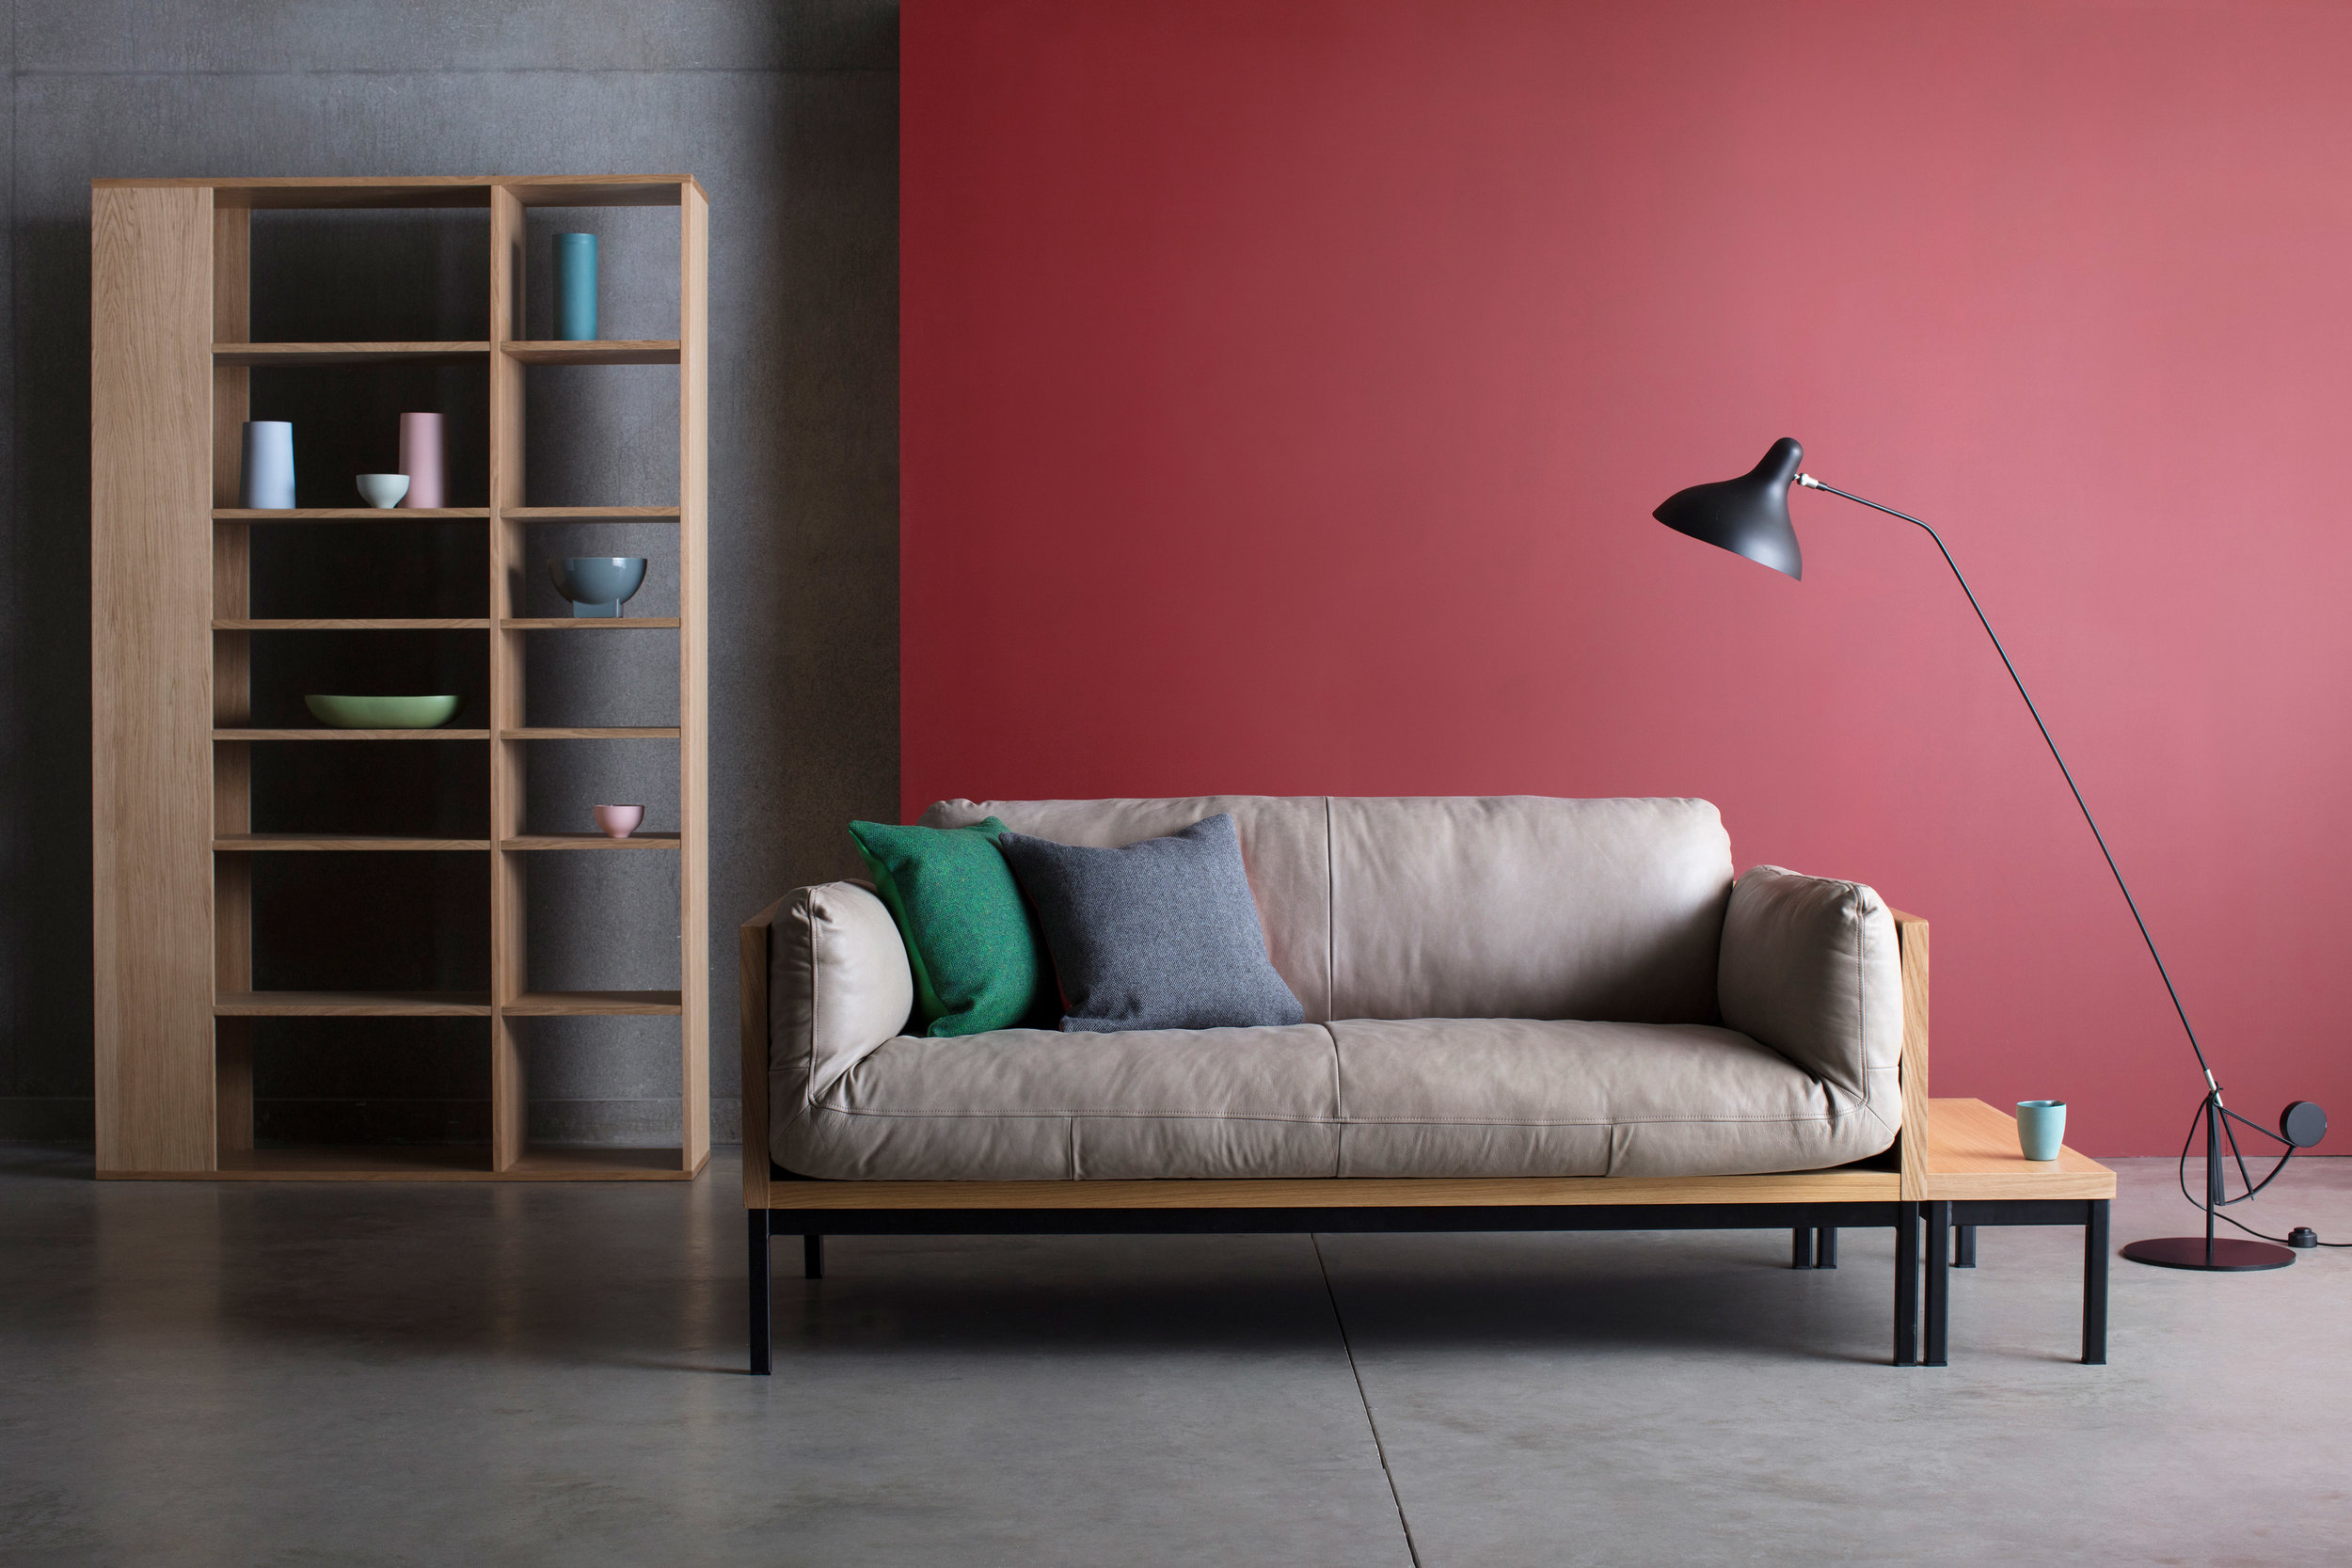 Another-Brand-Legna-Sofa-Lato-Furniture-Interiour.jpg